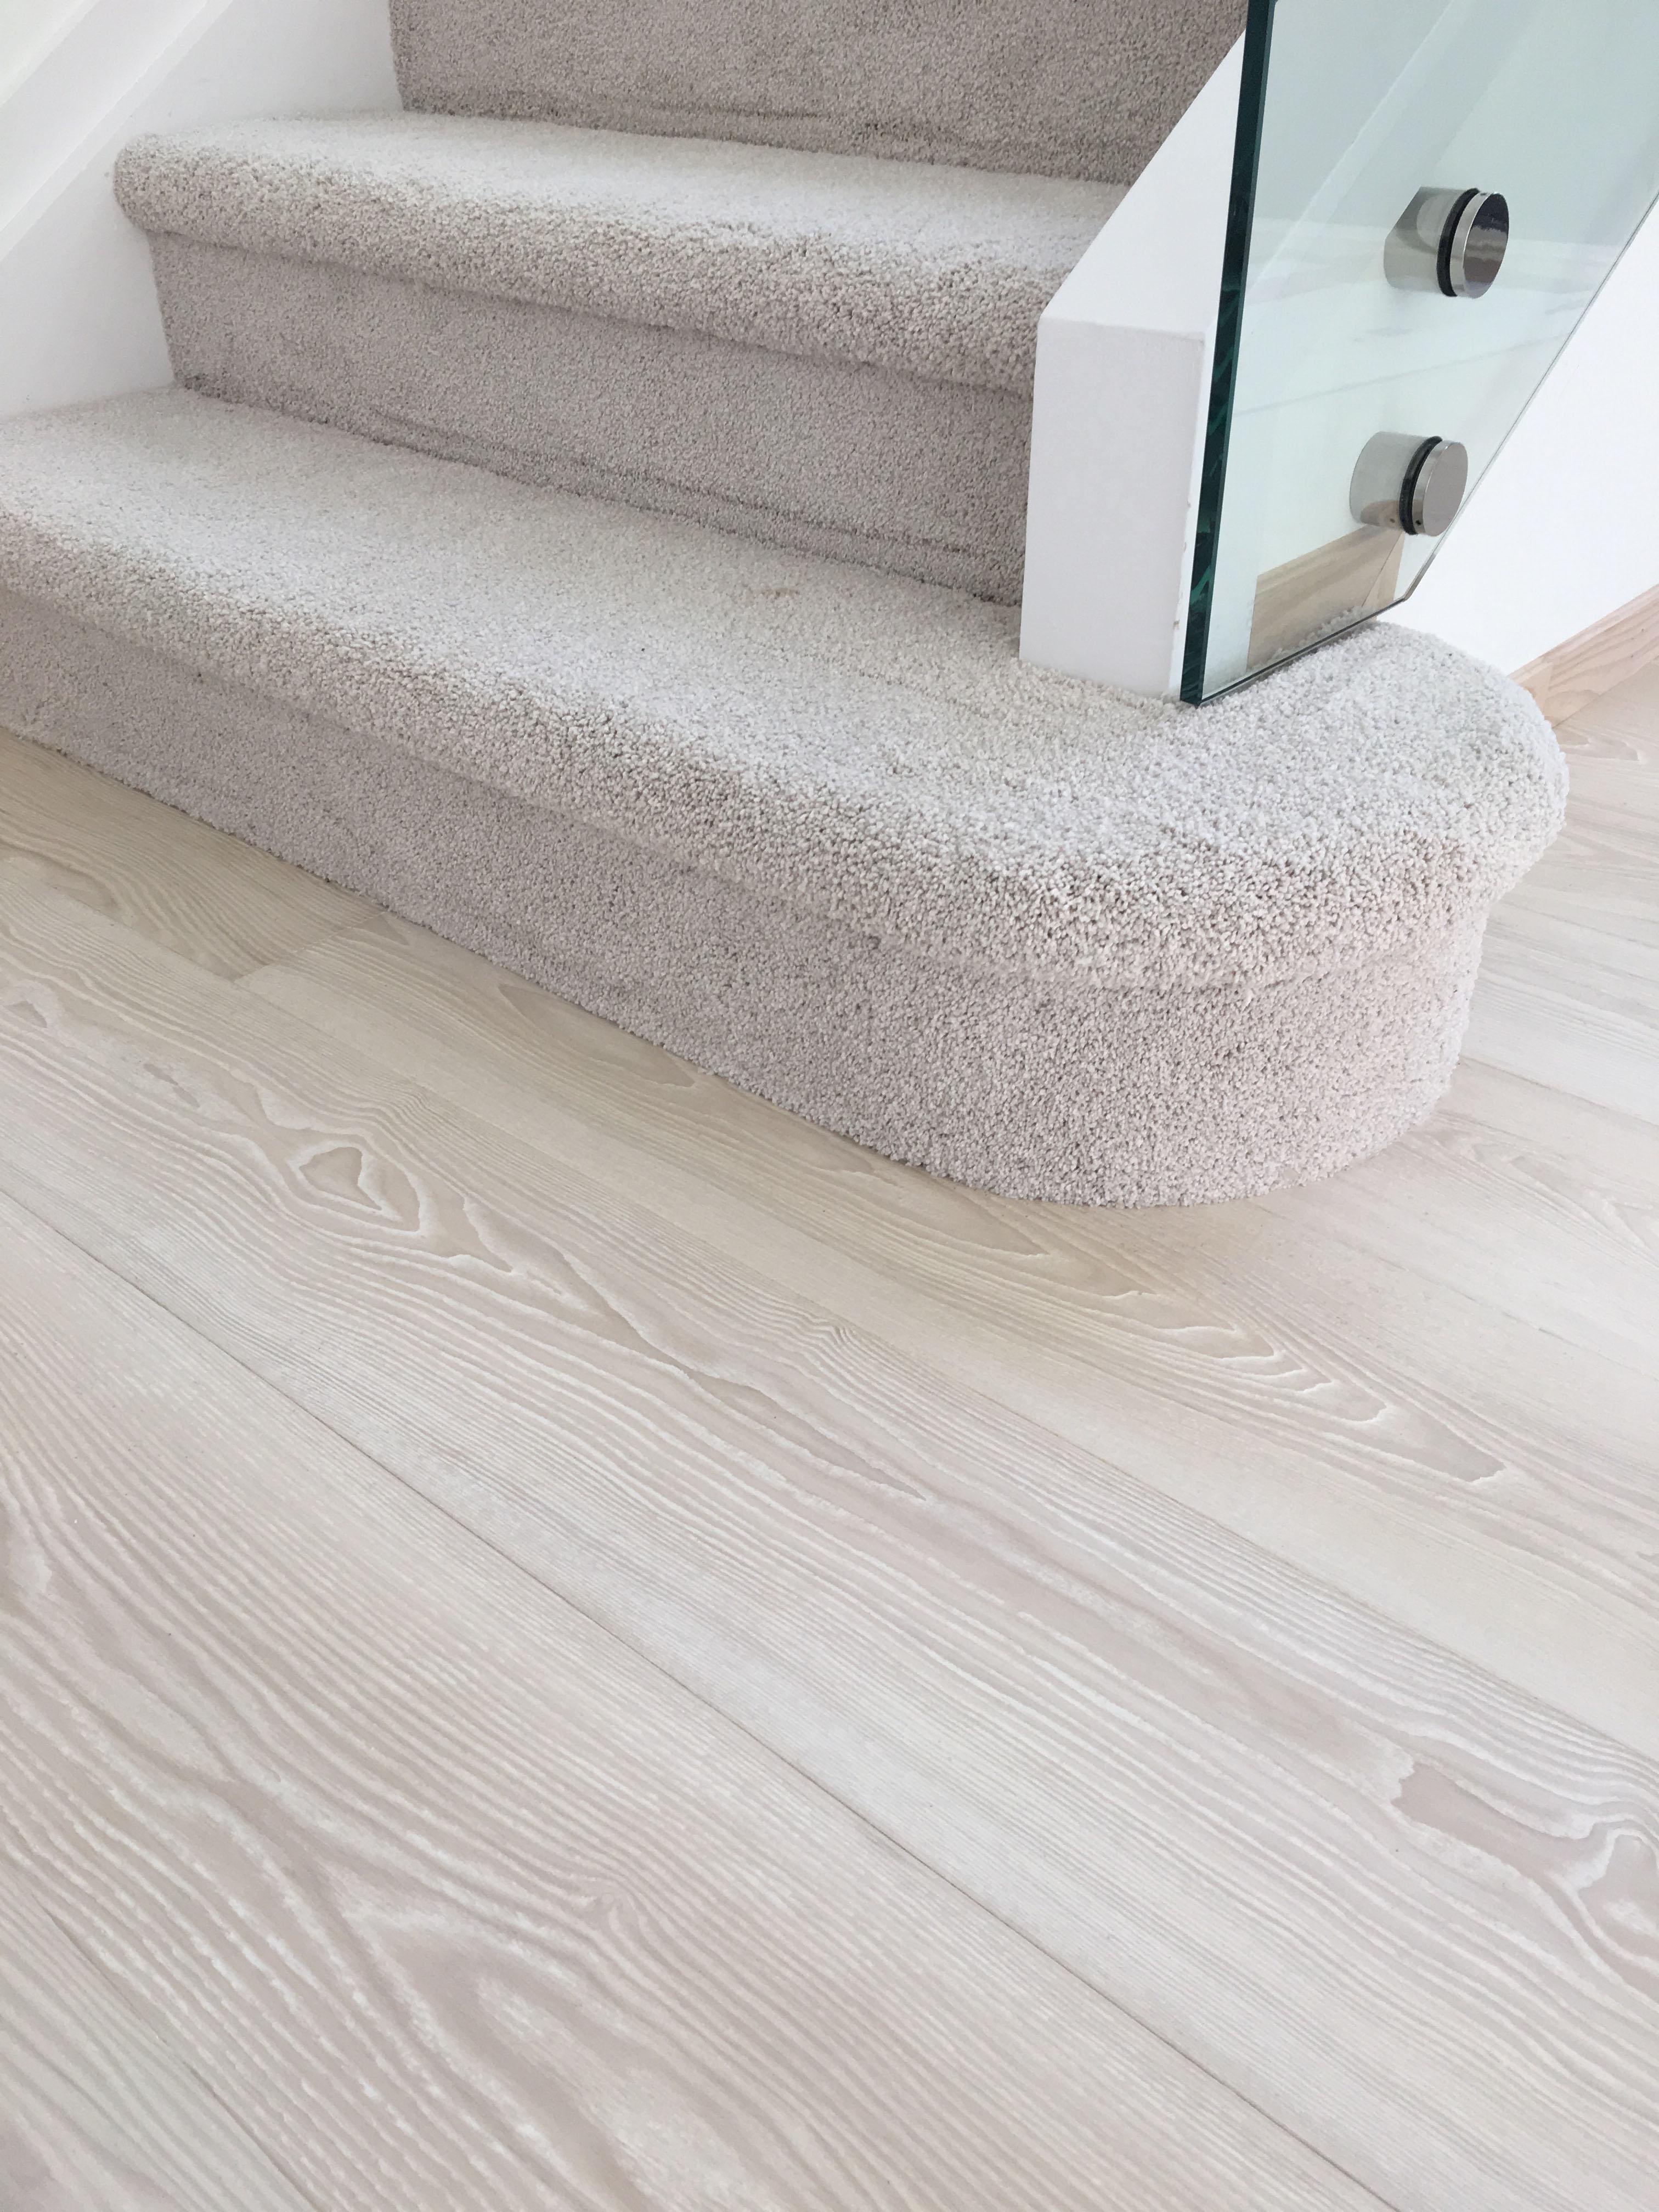 Engineered Hardwood Flooring, White Ash Laminate Flooring